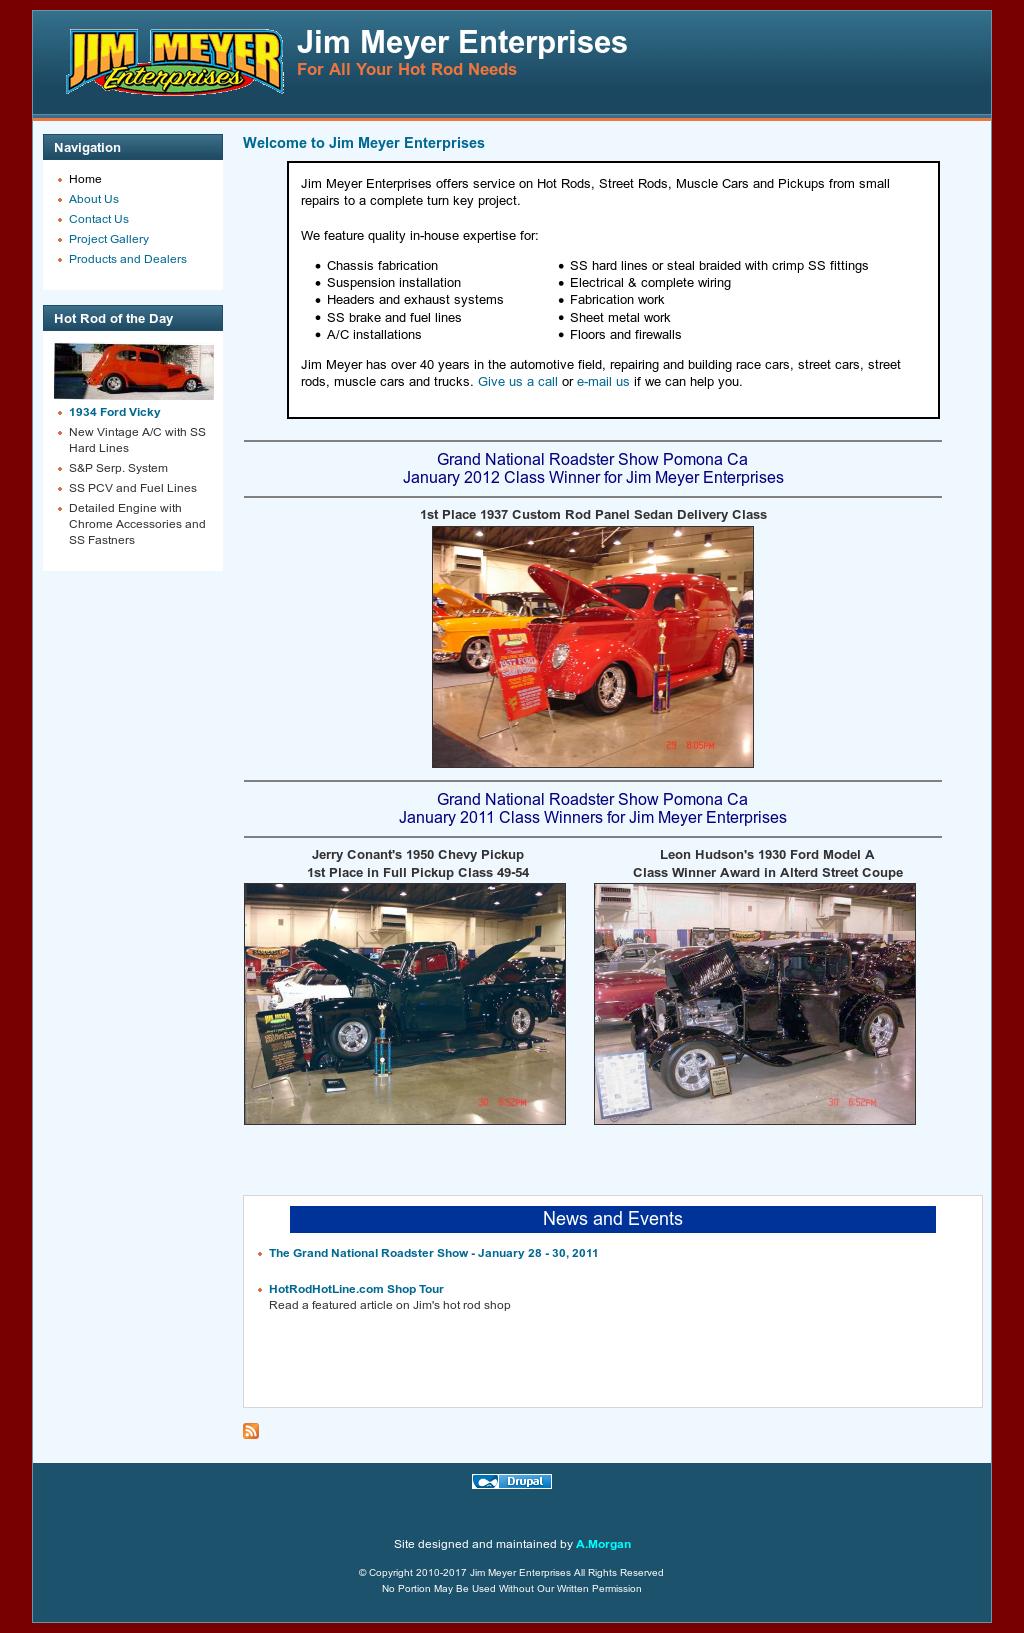 Jim Meyer Enterprises Competitors, Revenue and Employees - Owler